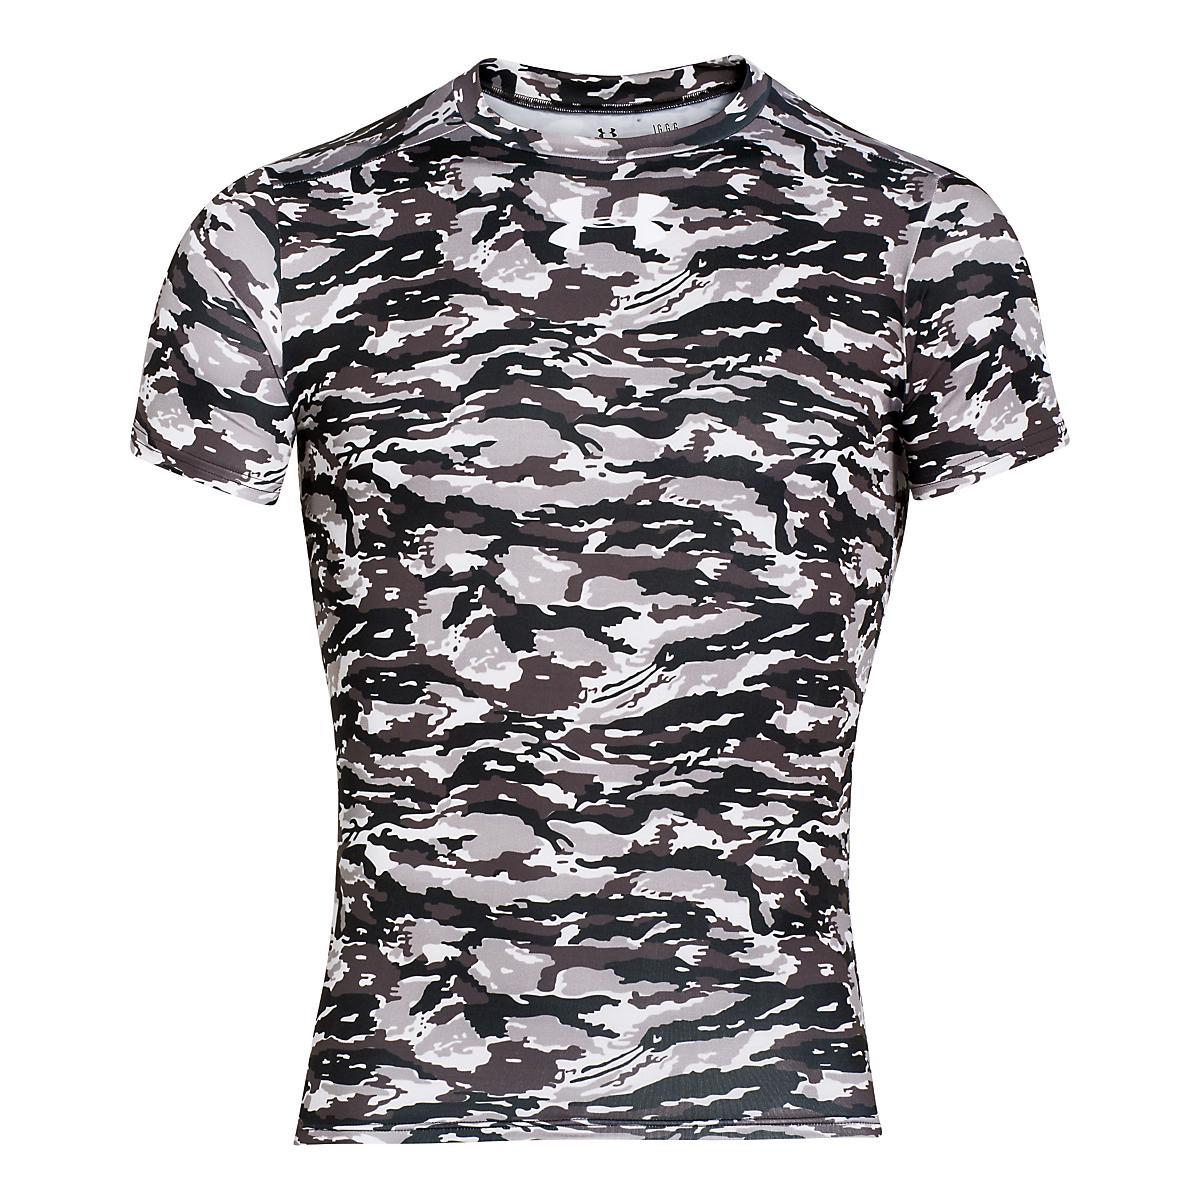 Men's Under Armour�Woodland Stealth Camo Compression Shirt